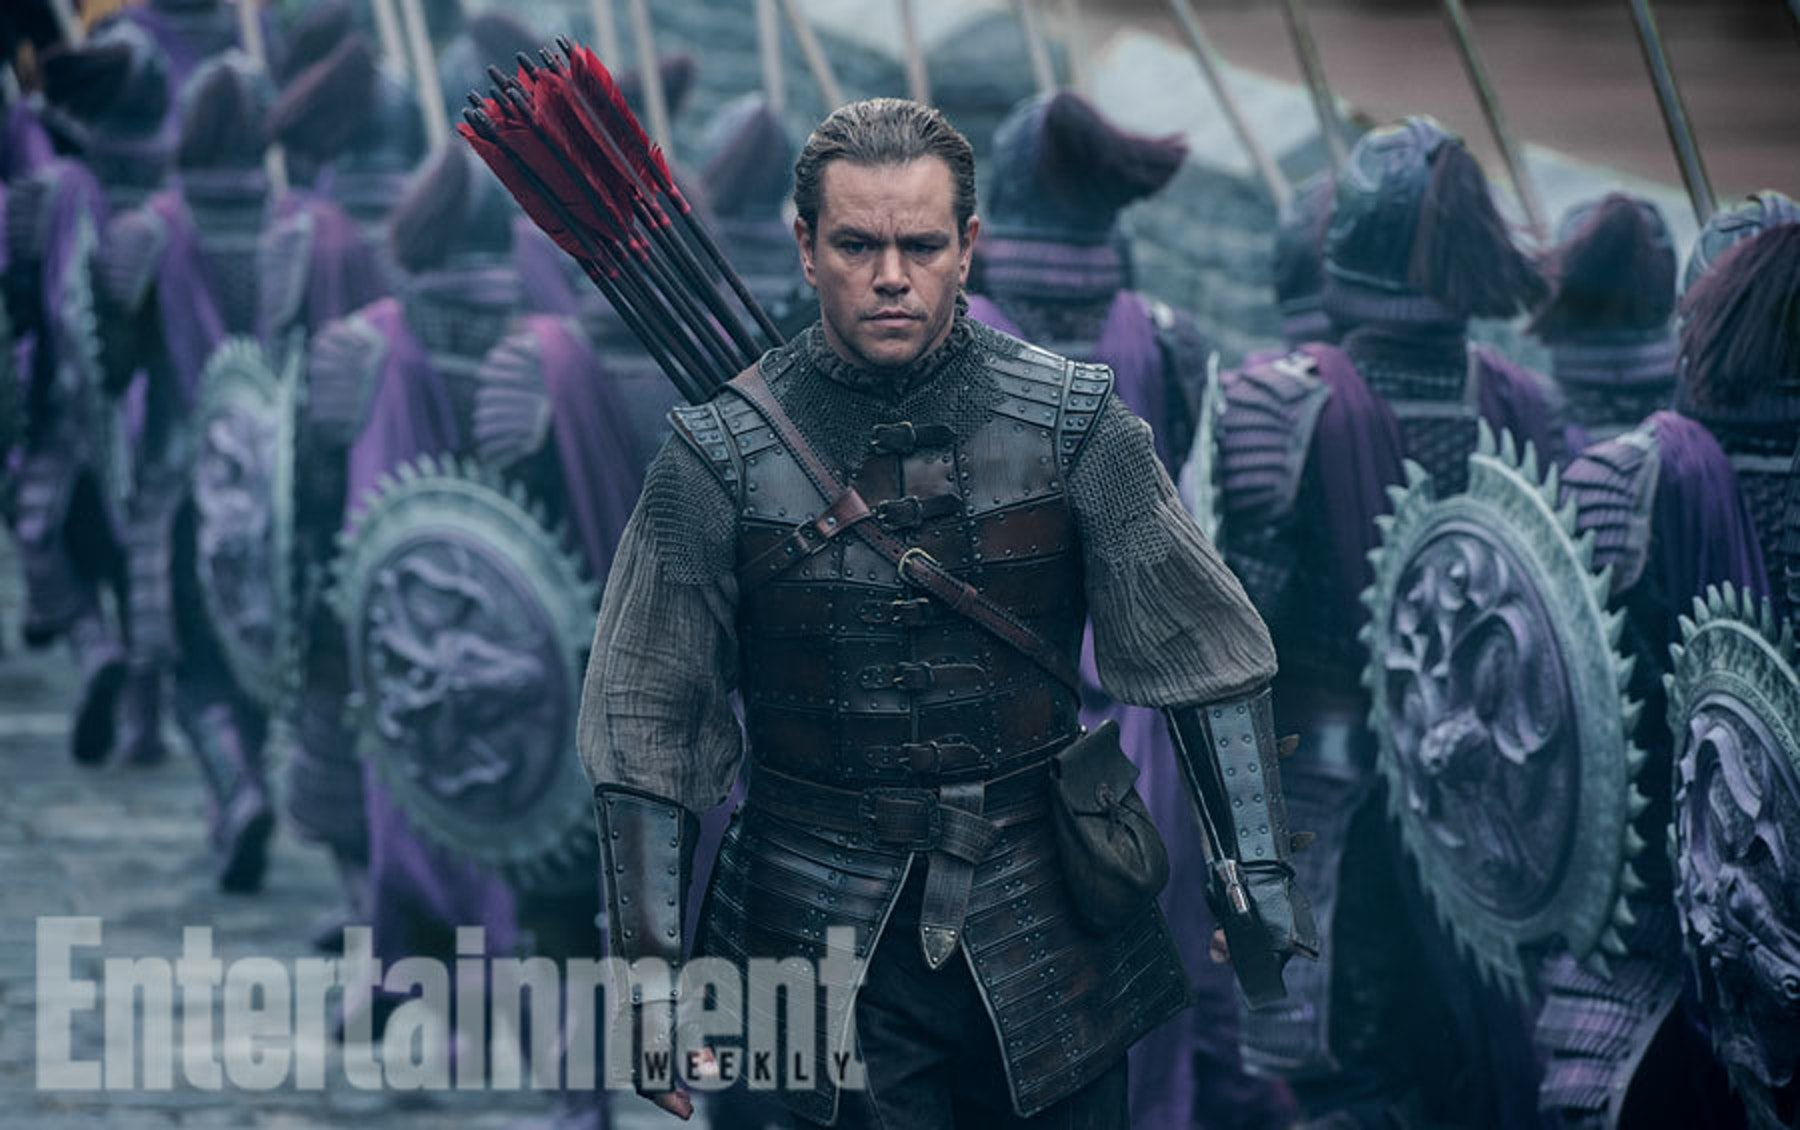 Matt Damon doing his best ancient Chinese Hawkeye impression.